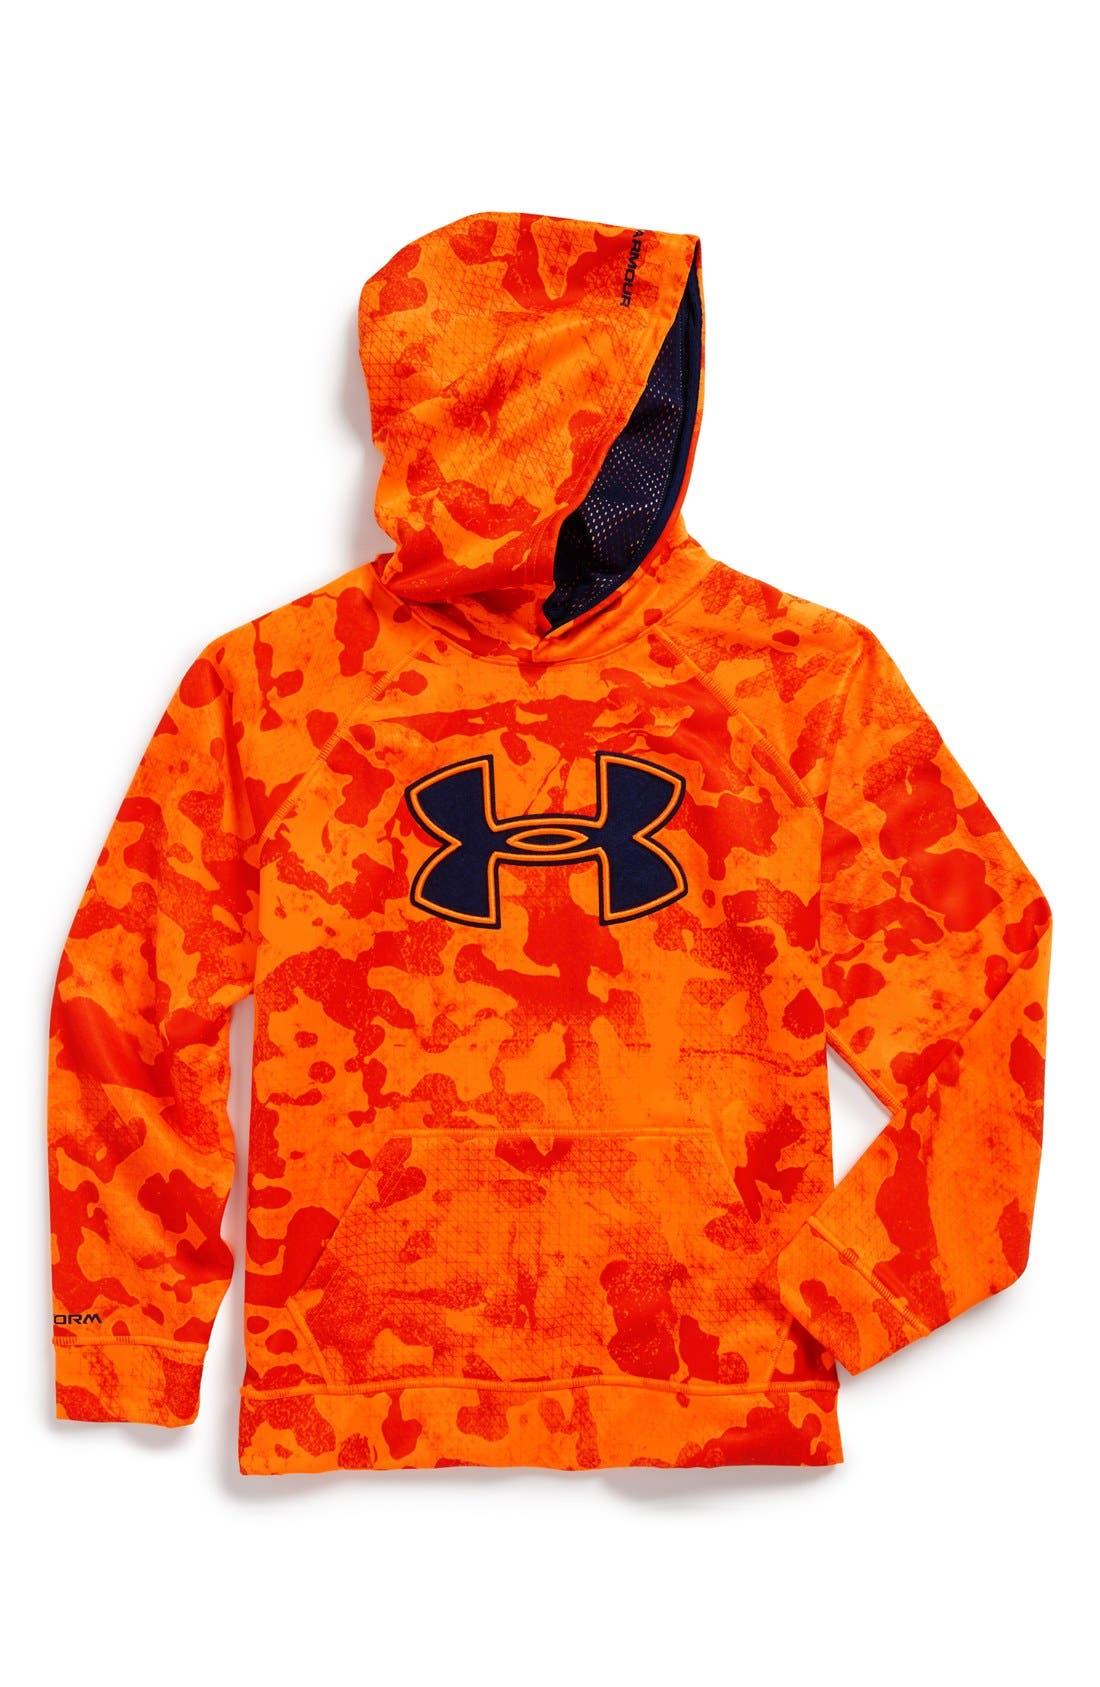 Alternate Image 1 Selected - Under Armour 'Big Logo - Storm' Hoodie (Big Boys)